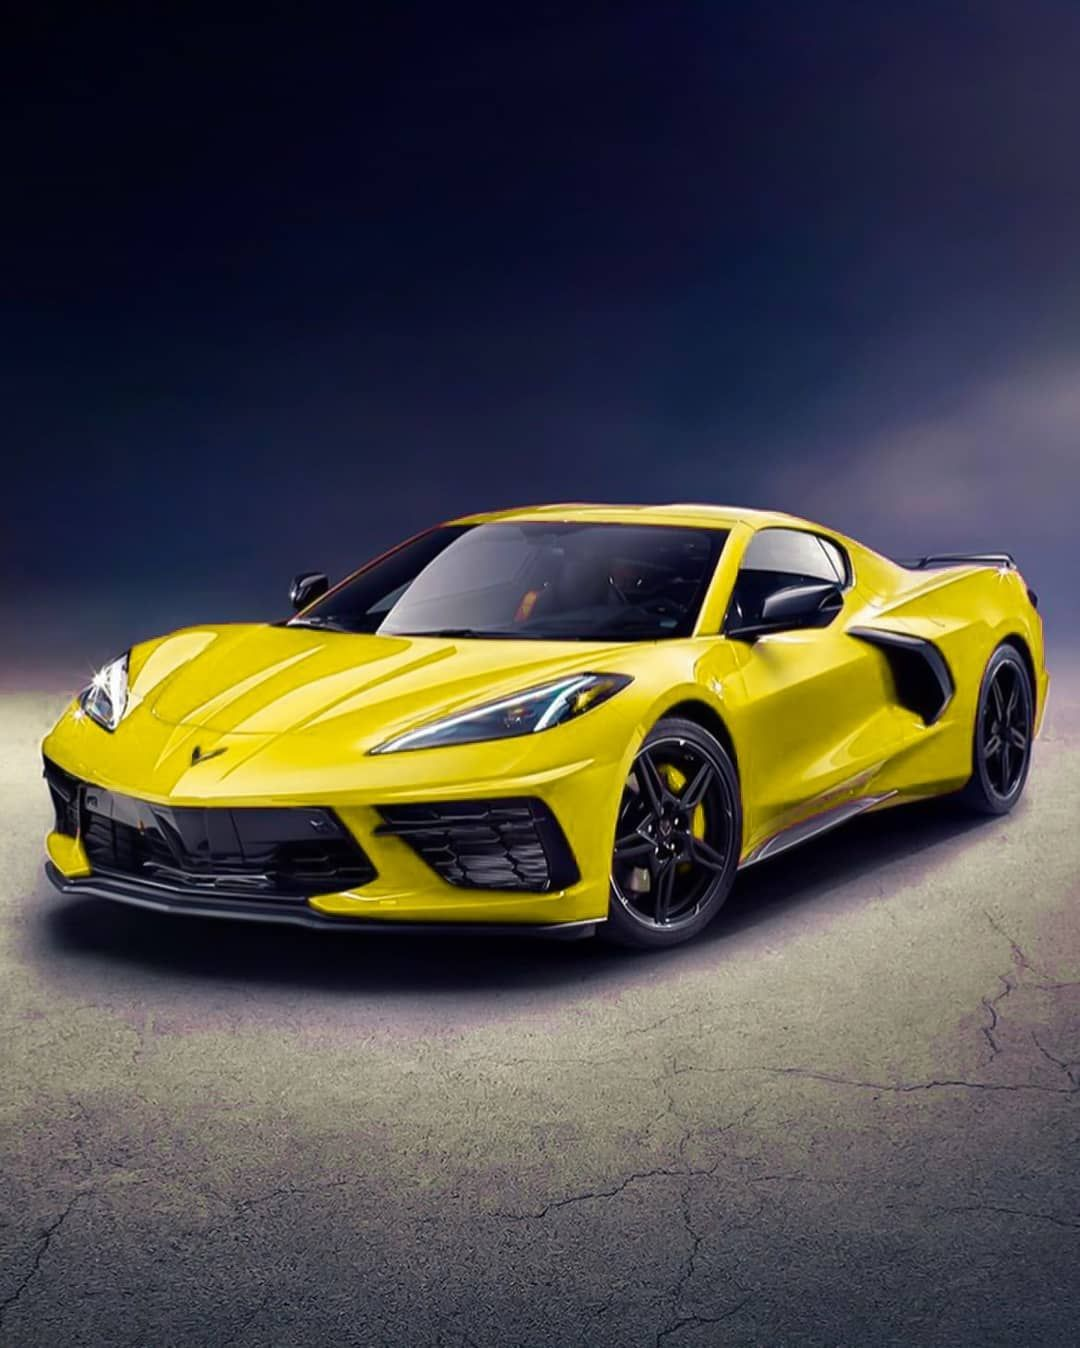 3 Yellow Corvette C8 Carspot Carspotting Automotive Best Automobile Race Photography Like Su Corvette Yellow Corvette Super Cars